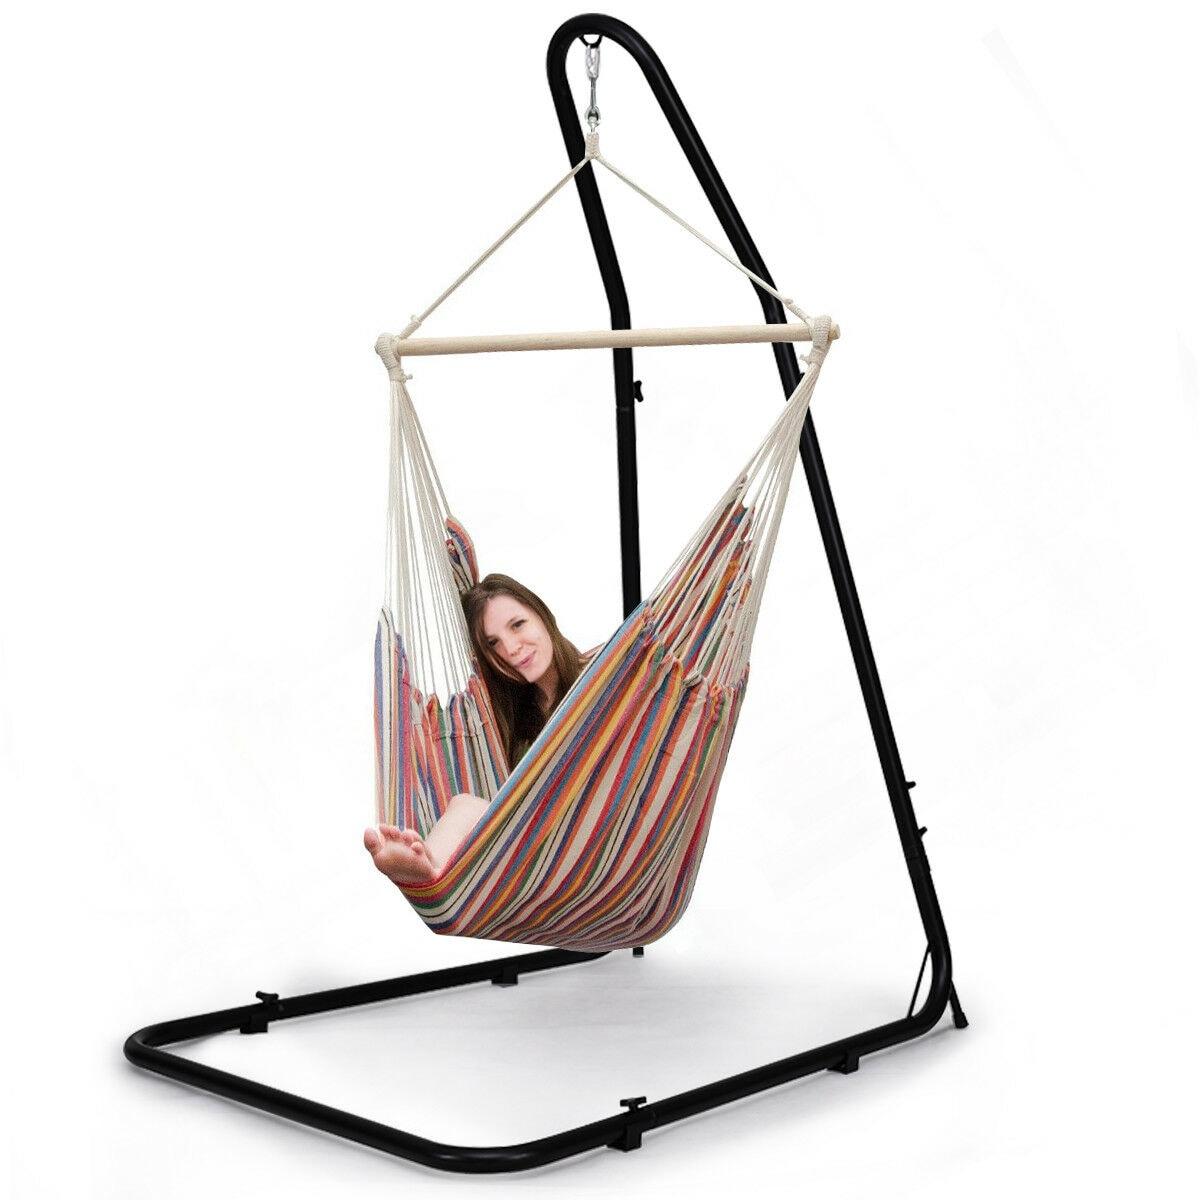 Shop Costway Adjustable Hammock Chair Stand For Hammocks Swings